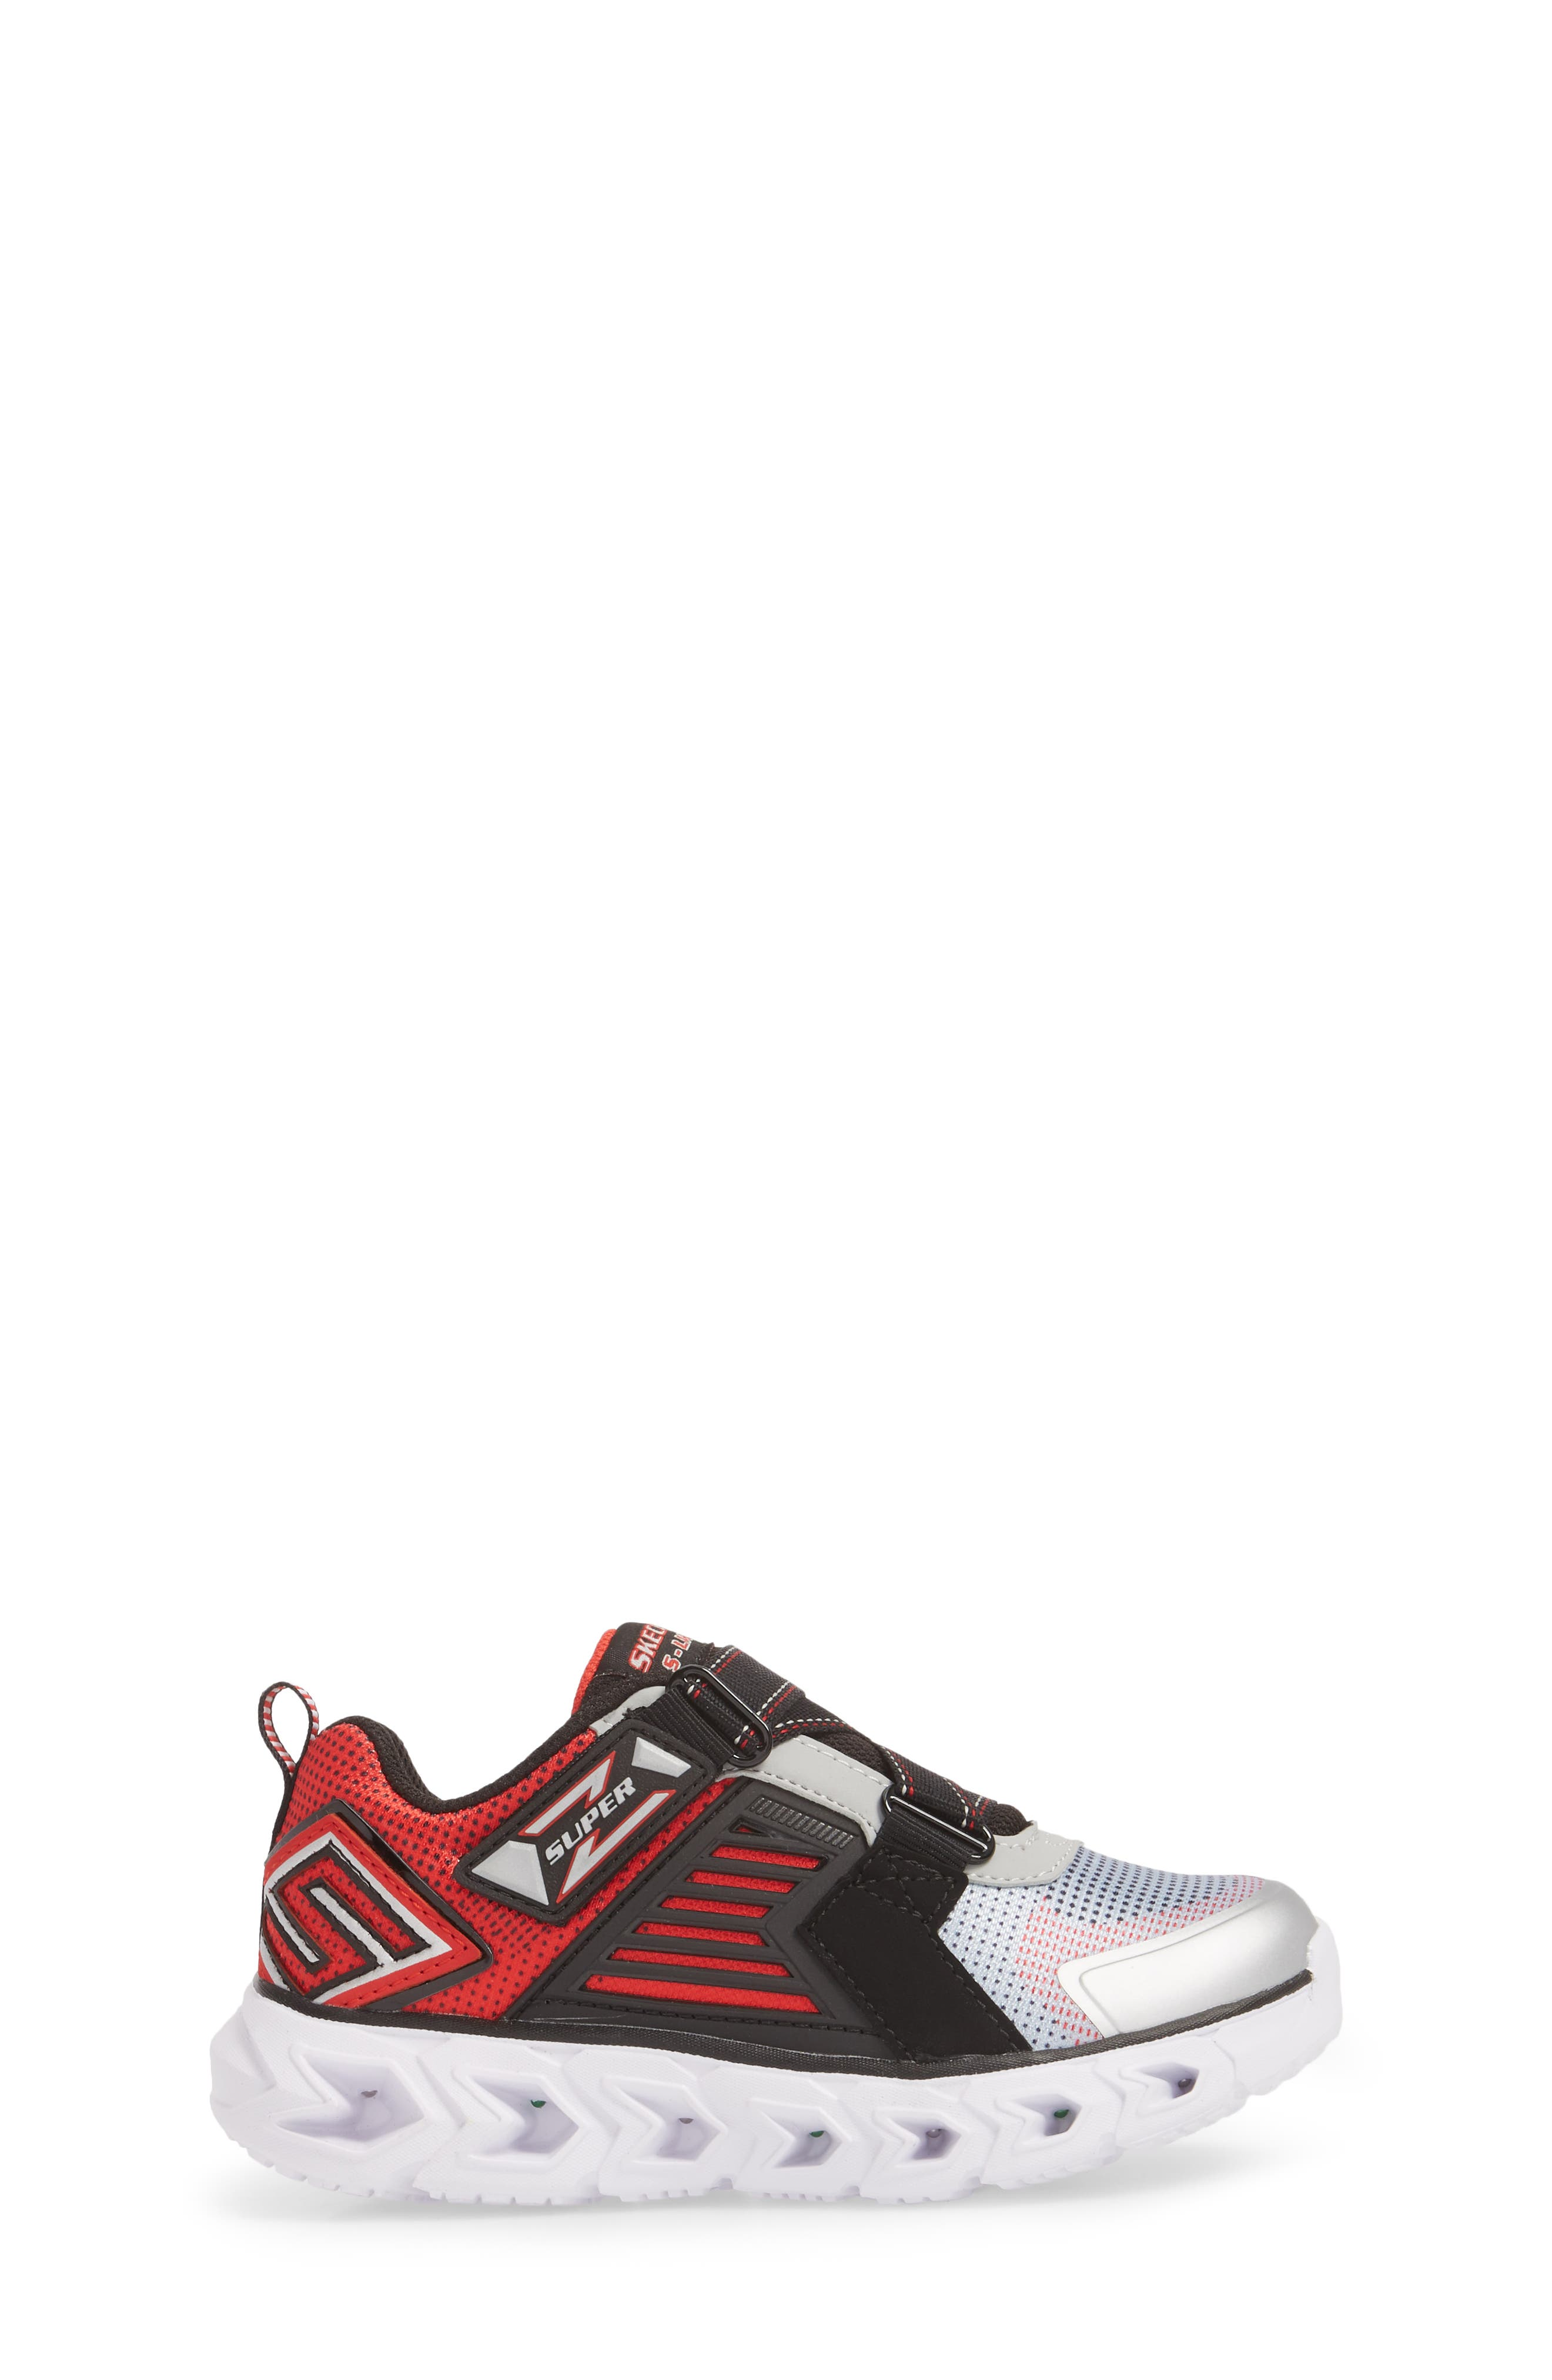 Hypno-Flash 2.0 Rapid Quake Sneakers,                             Alternate thumbnail 3, color,